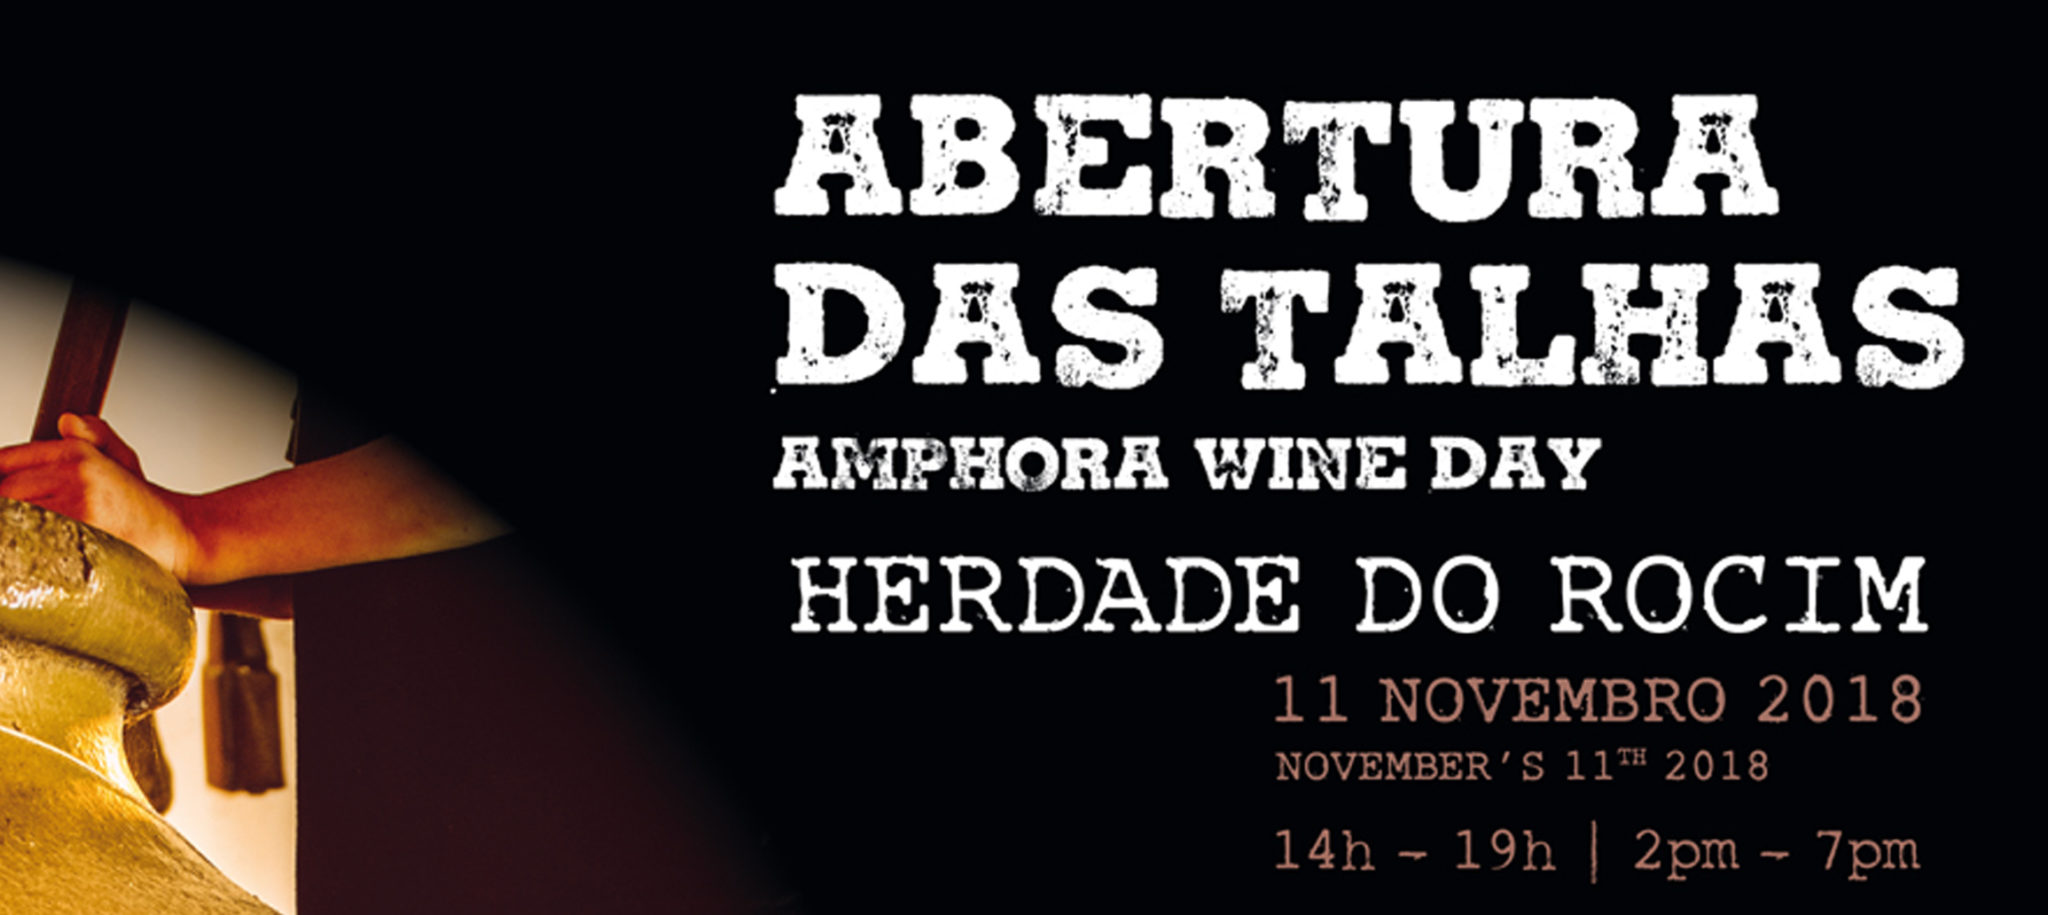 Amphora Wine Day 2018   Herdade do Rocim